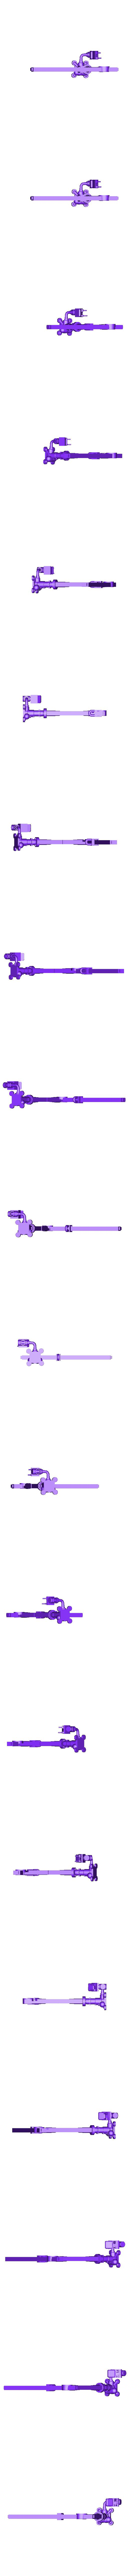 Jawa Shuttle scooter (crane assembled).stl Download free STL file Jawa Shuttle Scooter • 3D printer template, polerix